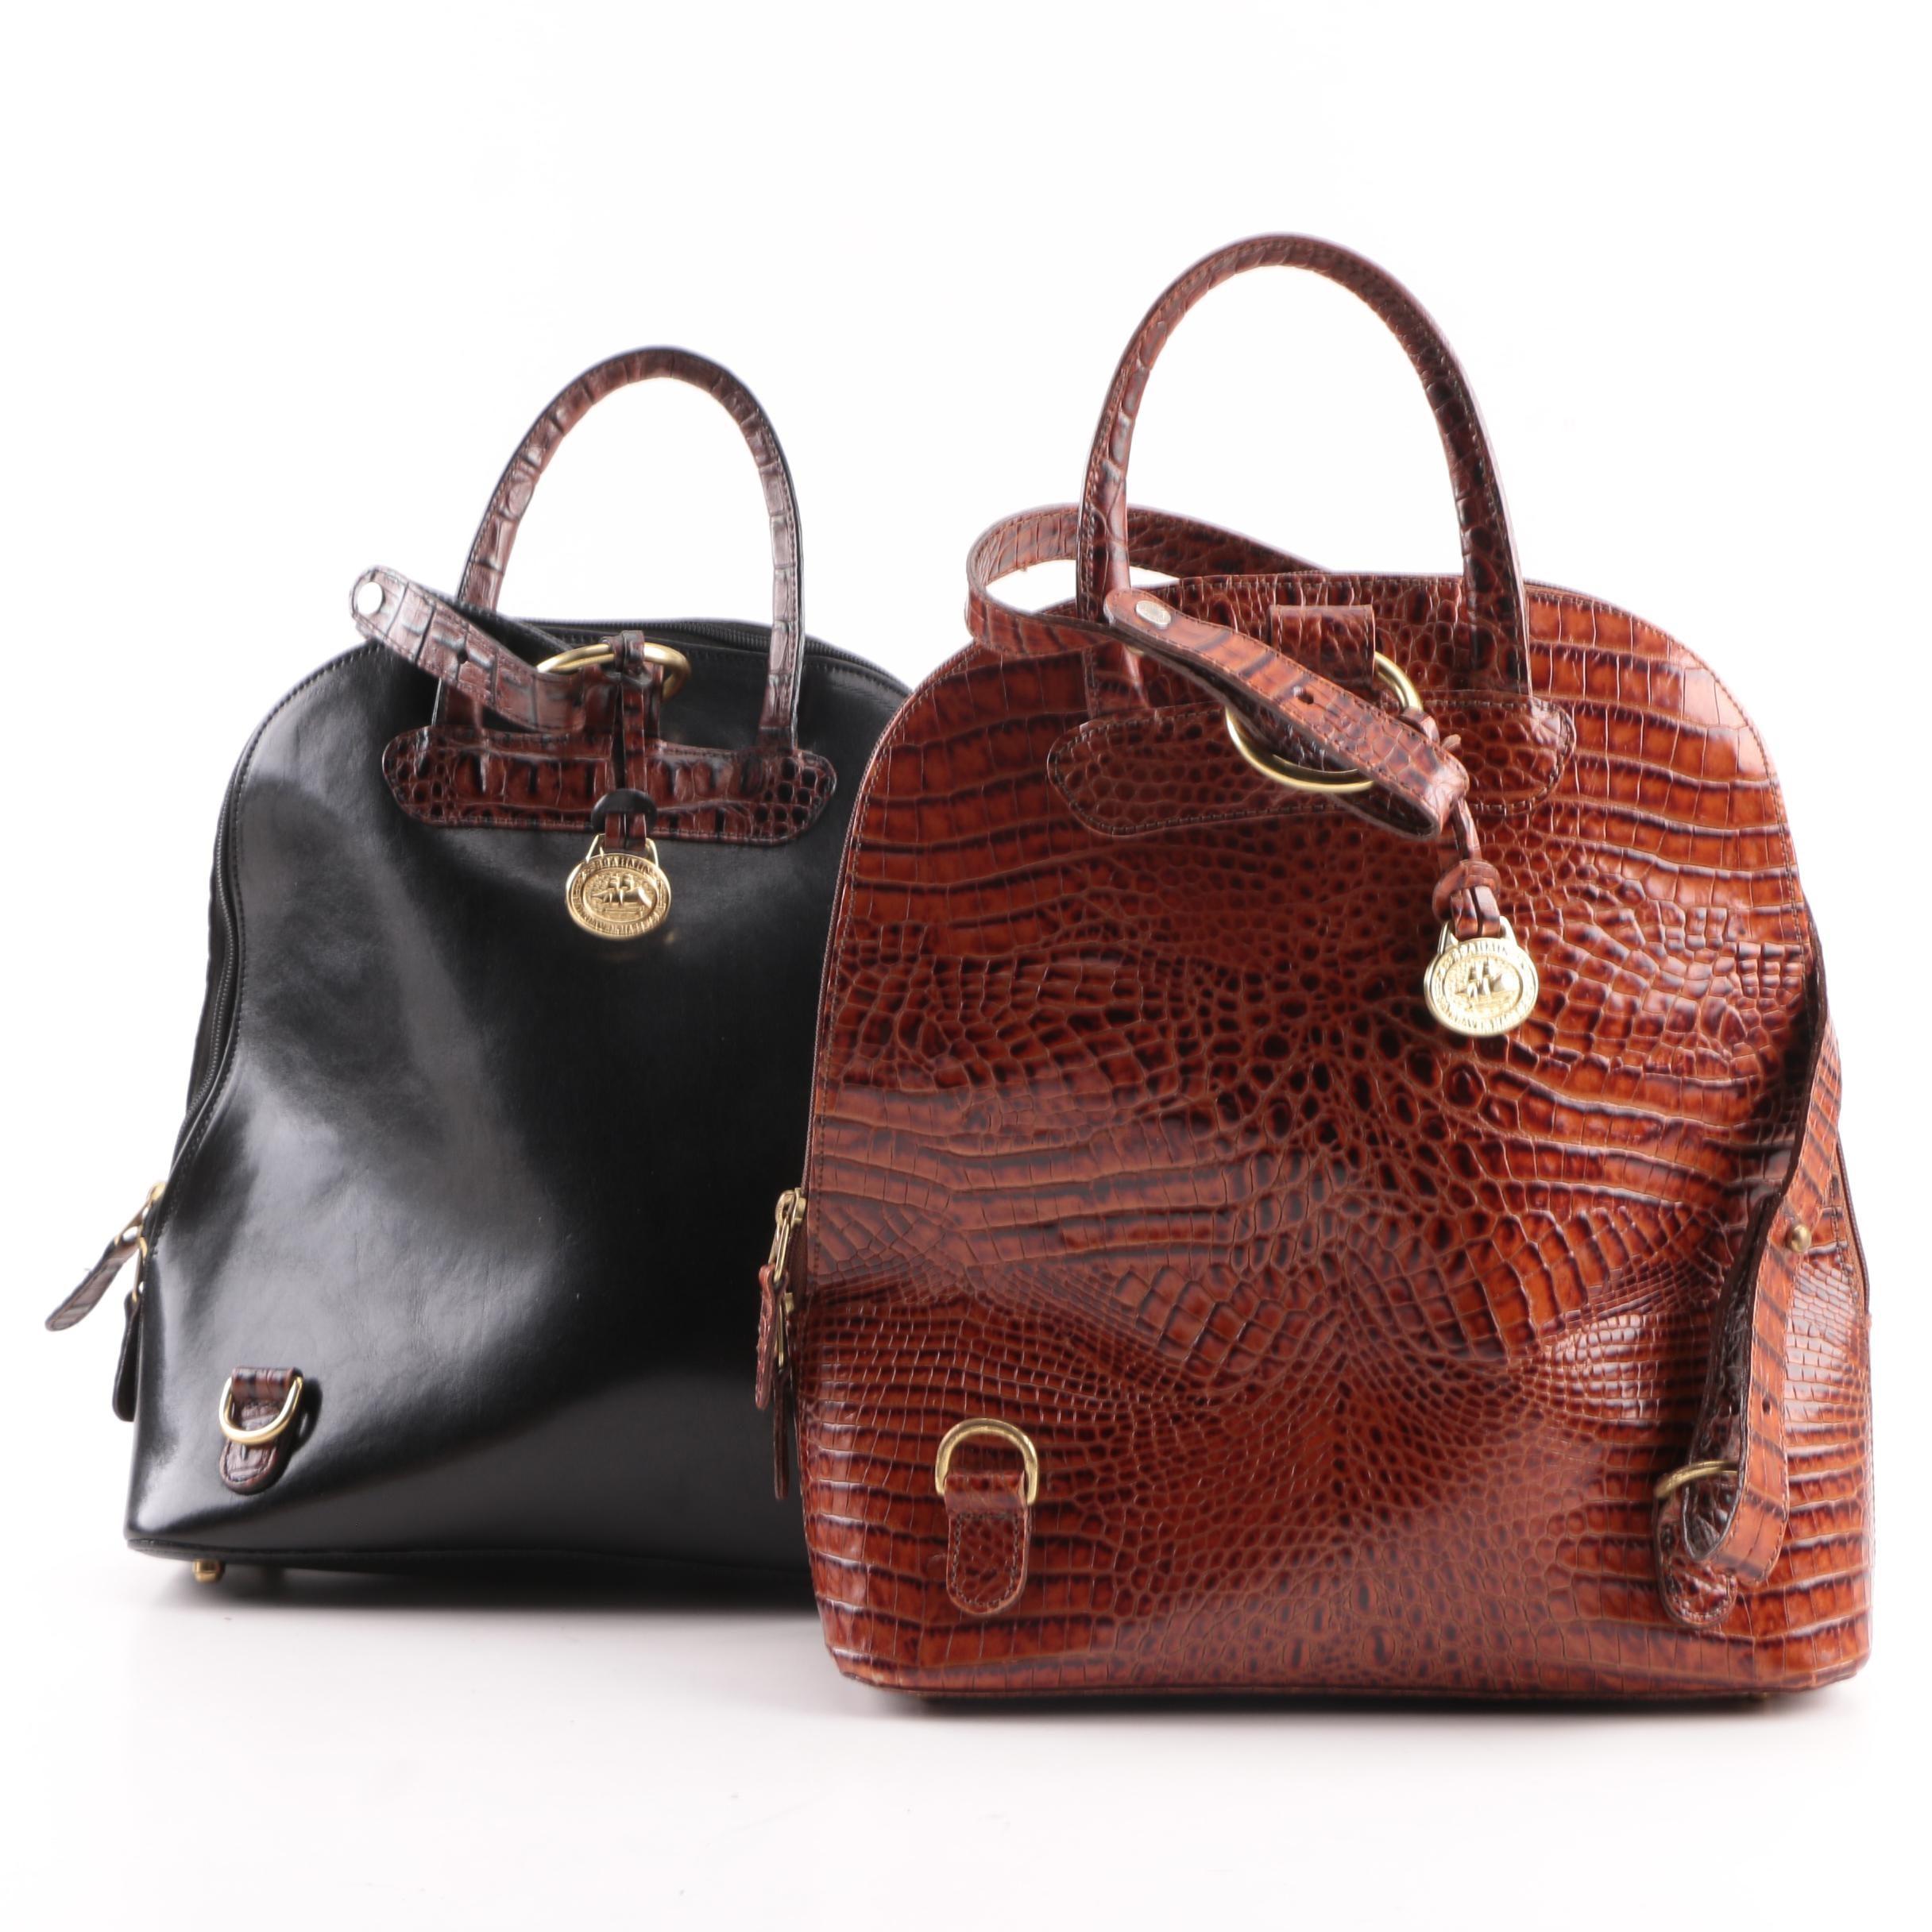 Brahmin Crocodile Embossed Pecan and Black Leather One-Shoulder Sling Backpacks